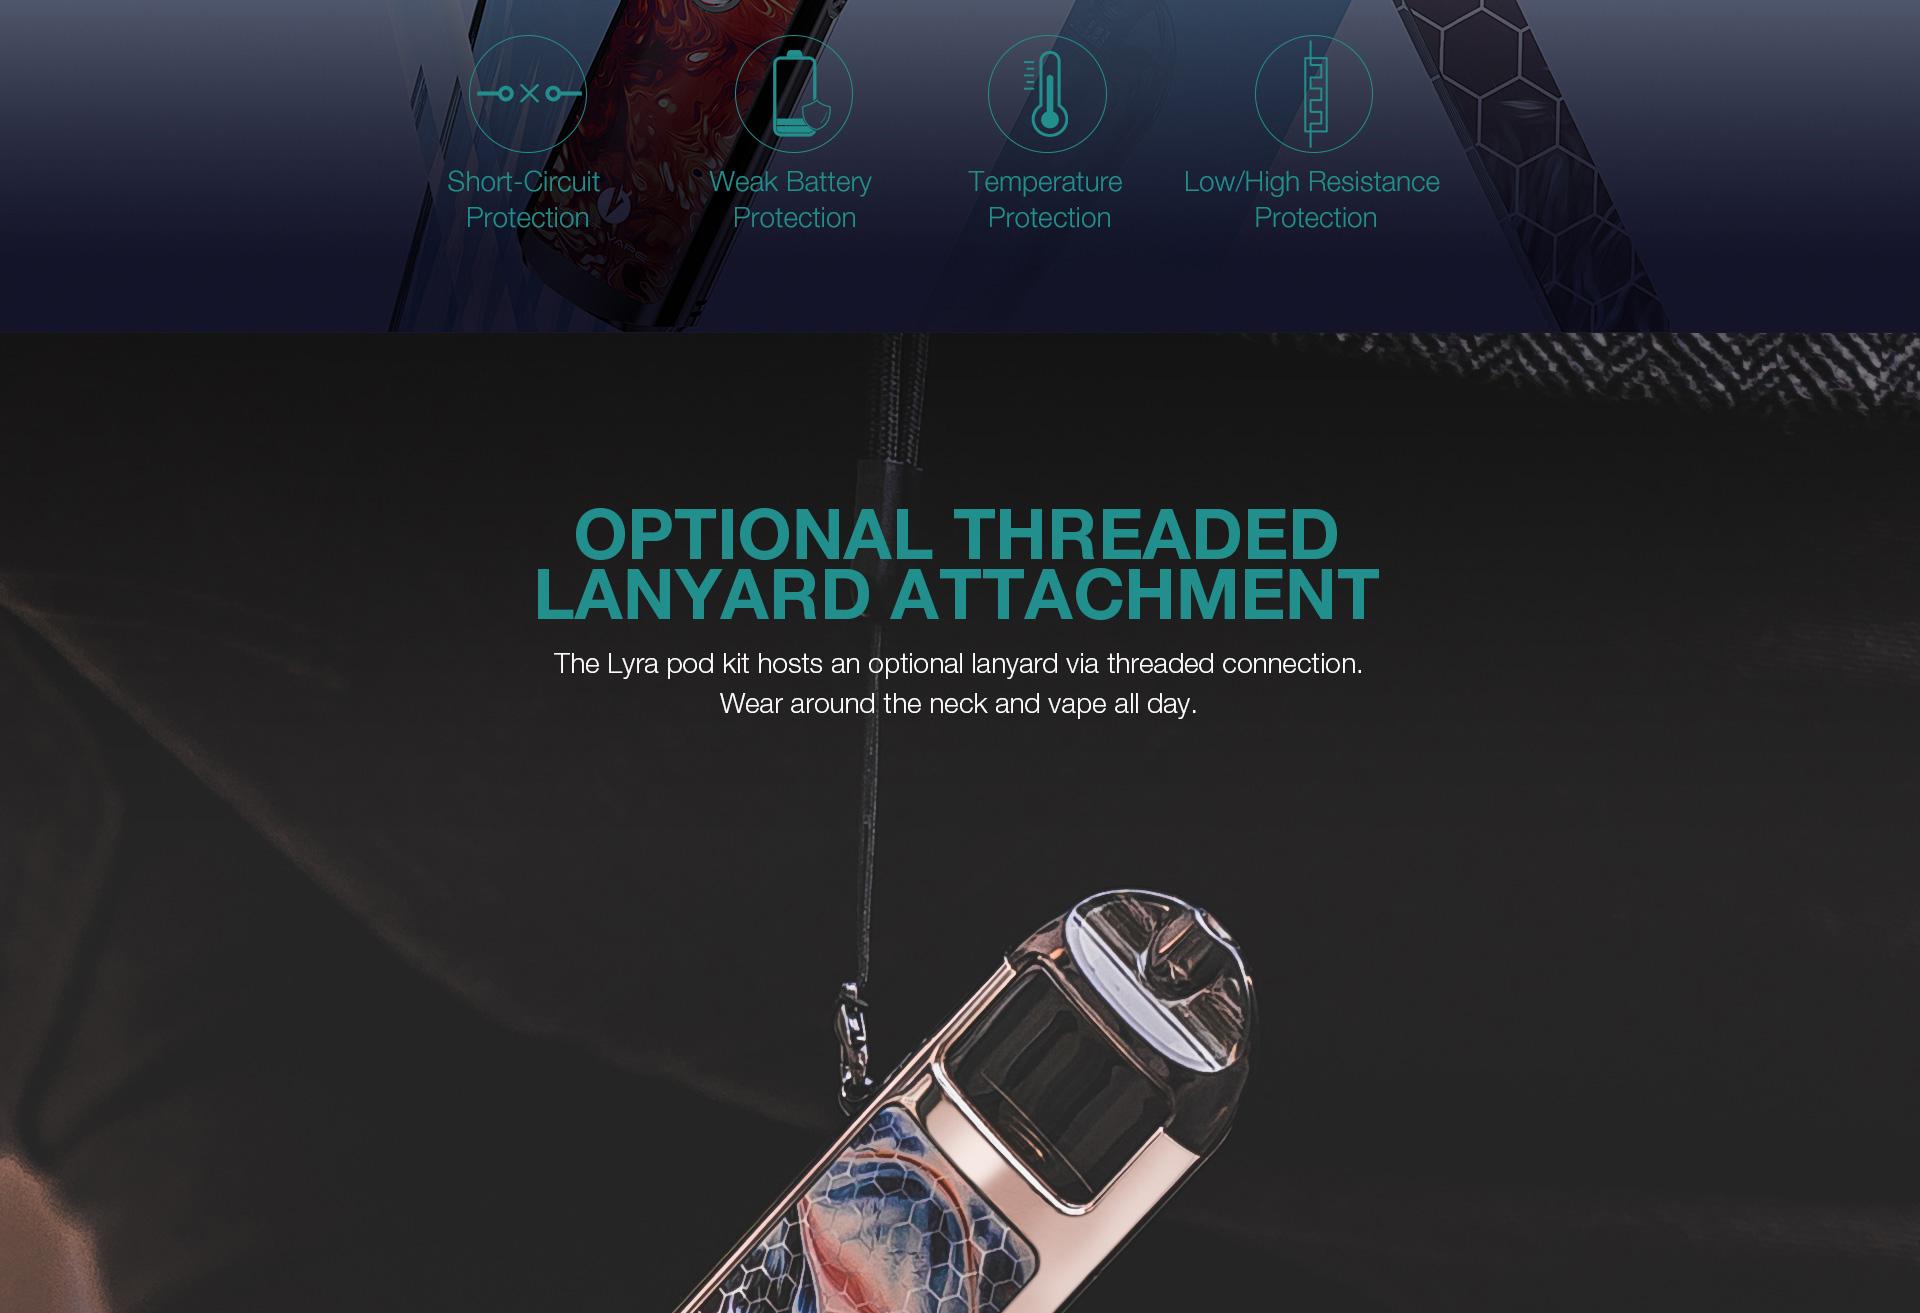 optional lanyard